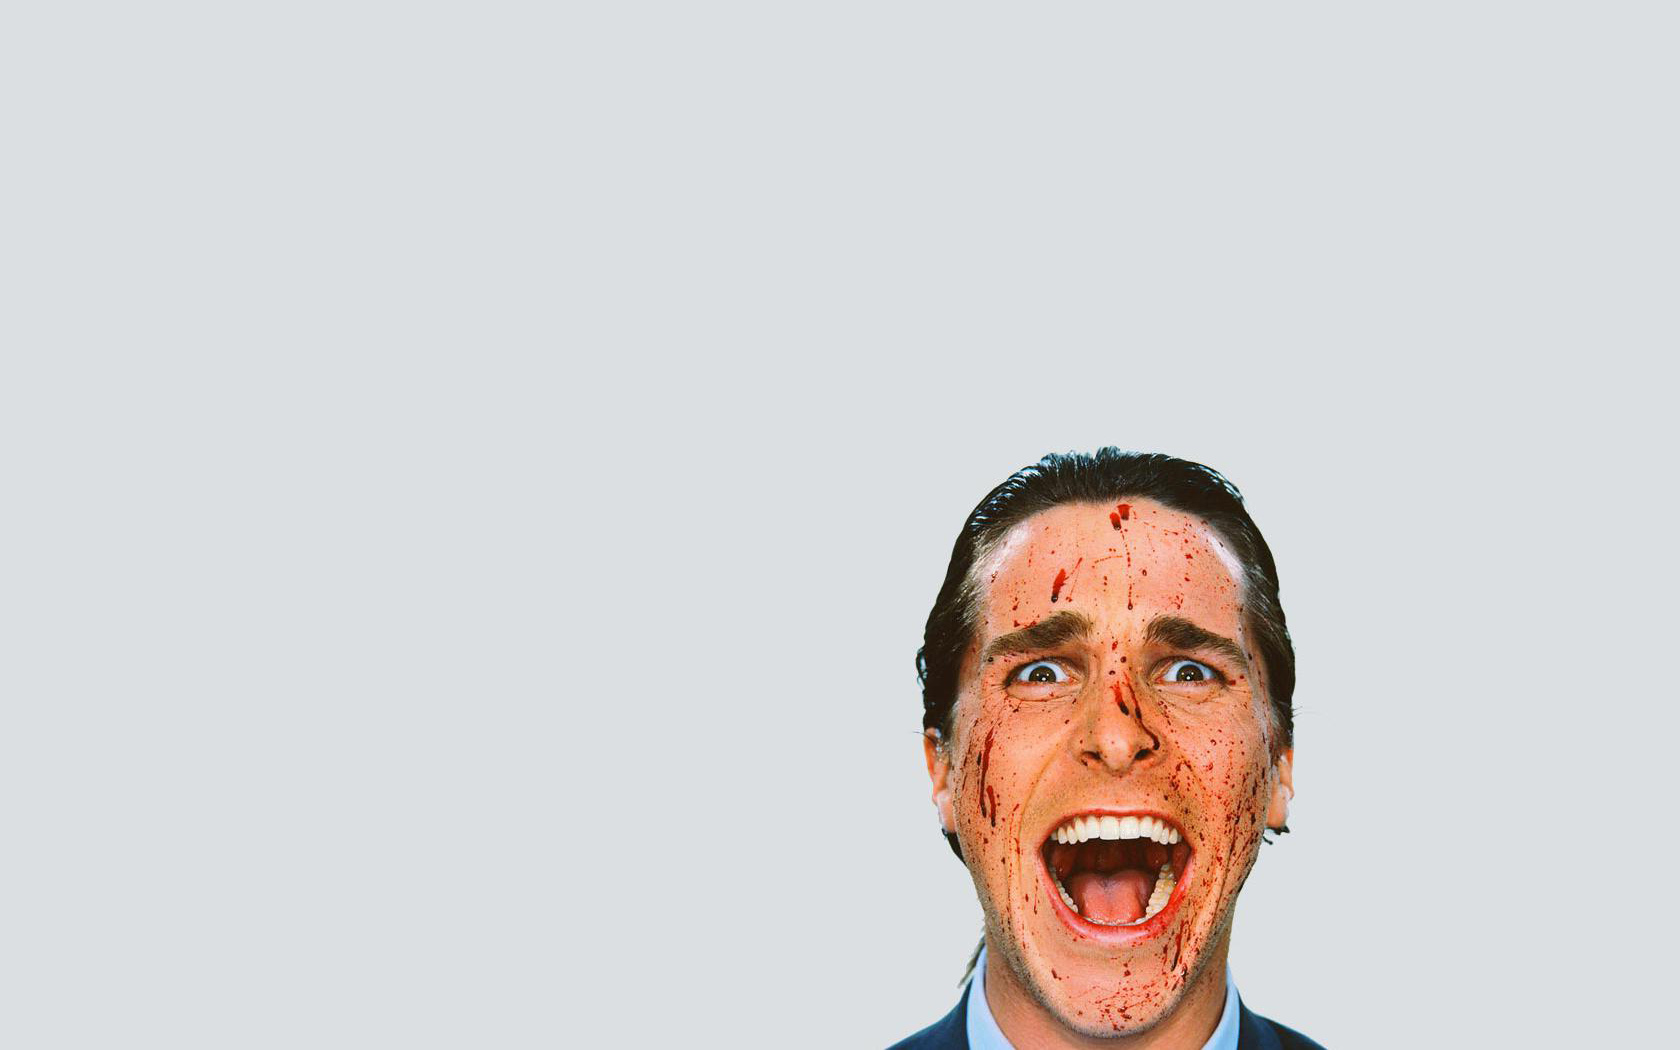 American Psycho Wallpapers 100 Full HDQ American Psycho 1680x1050